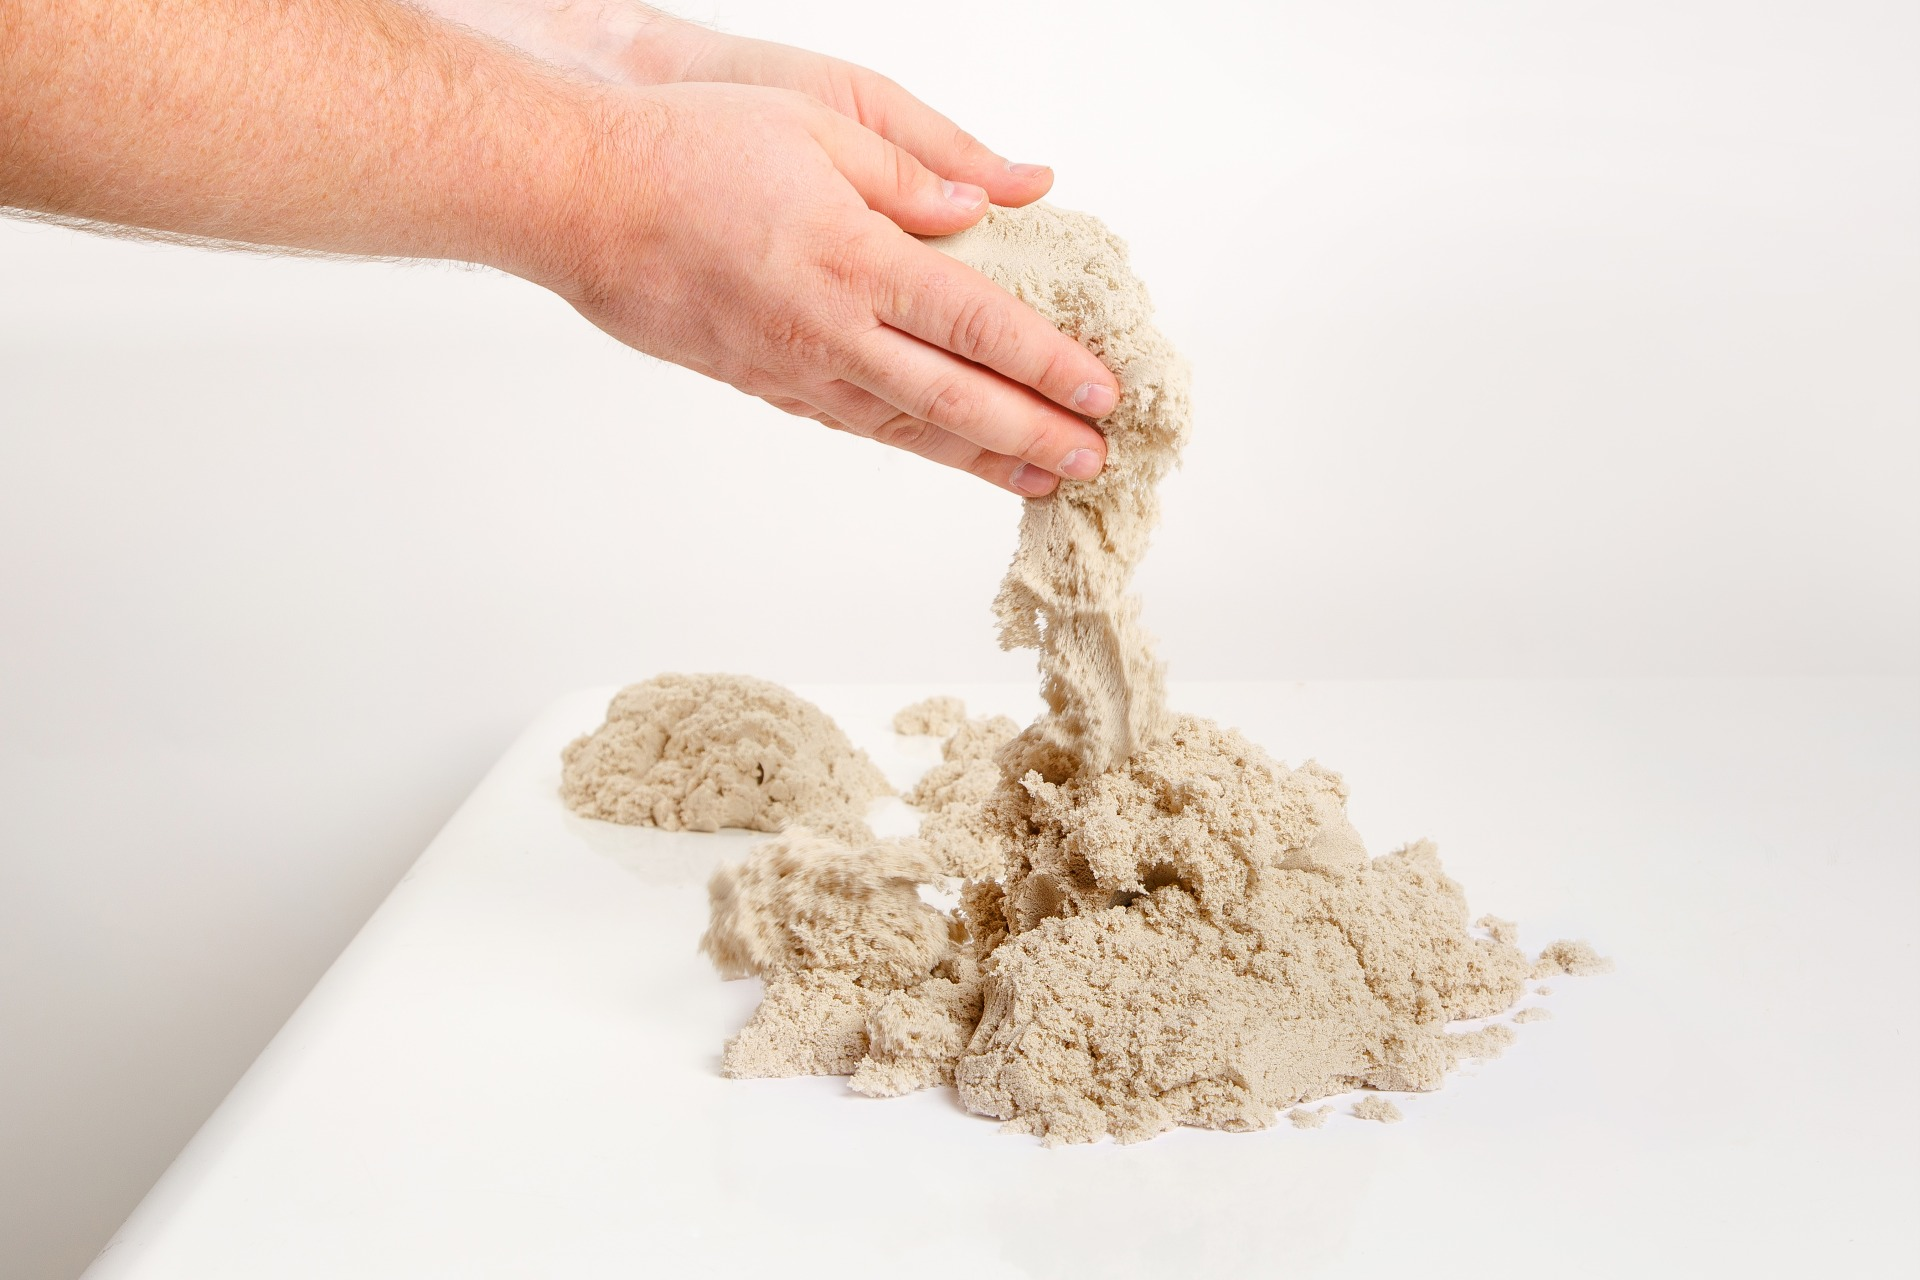 http://i.sand-therapy.ru/u/6d/5d1636609211e5a576b45cd2ce5662/-/high-4139.jpg